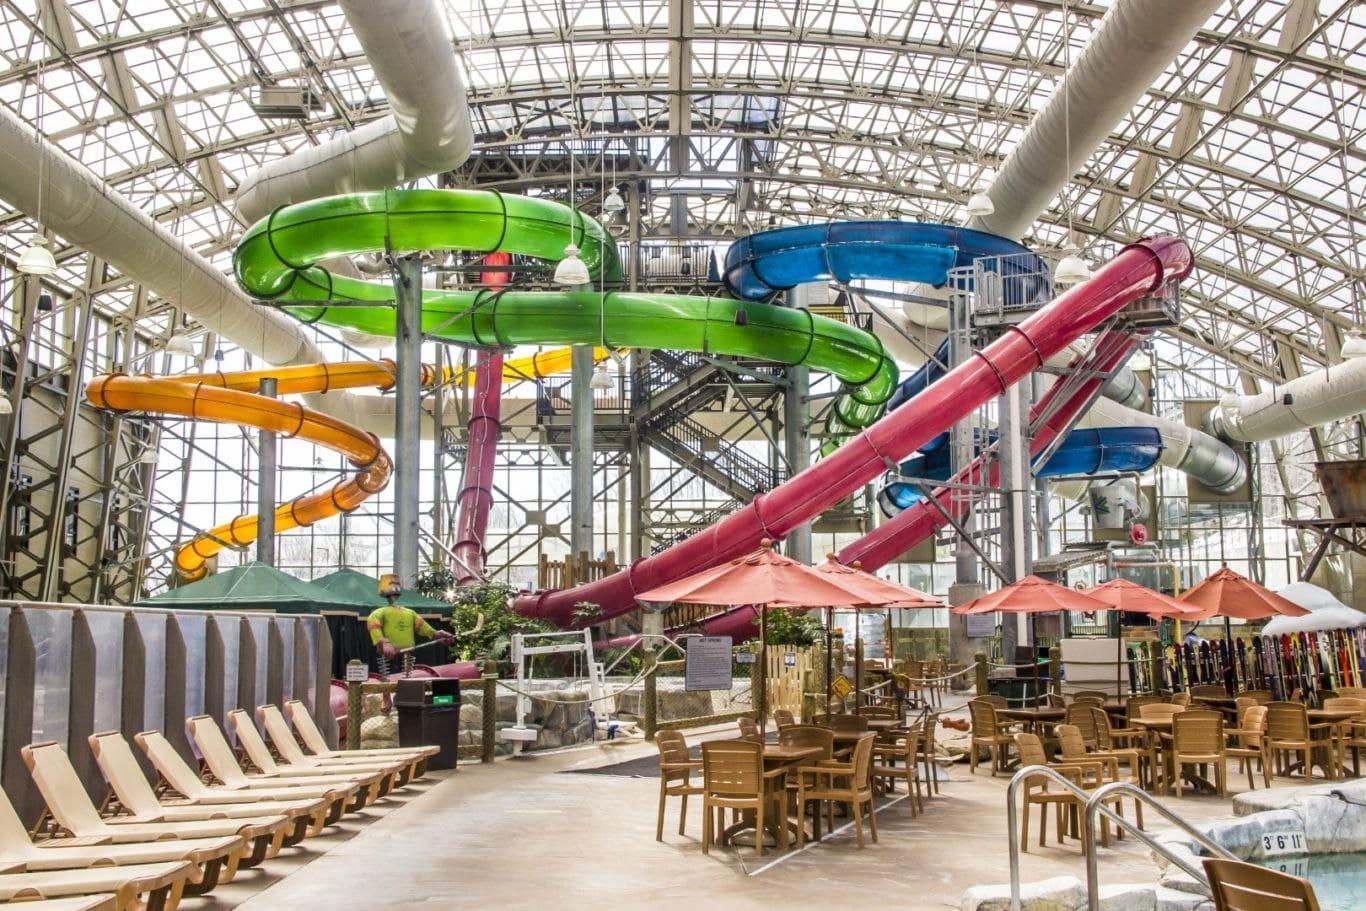 Jay Peak Resort - Indoor Waterpark